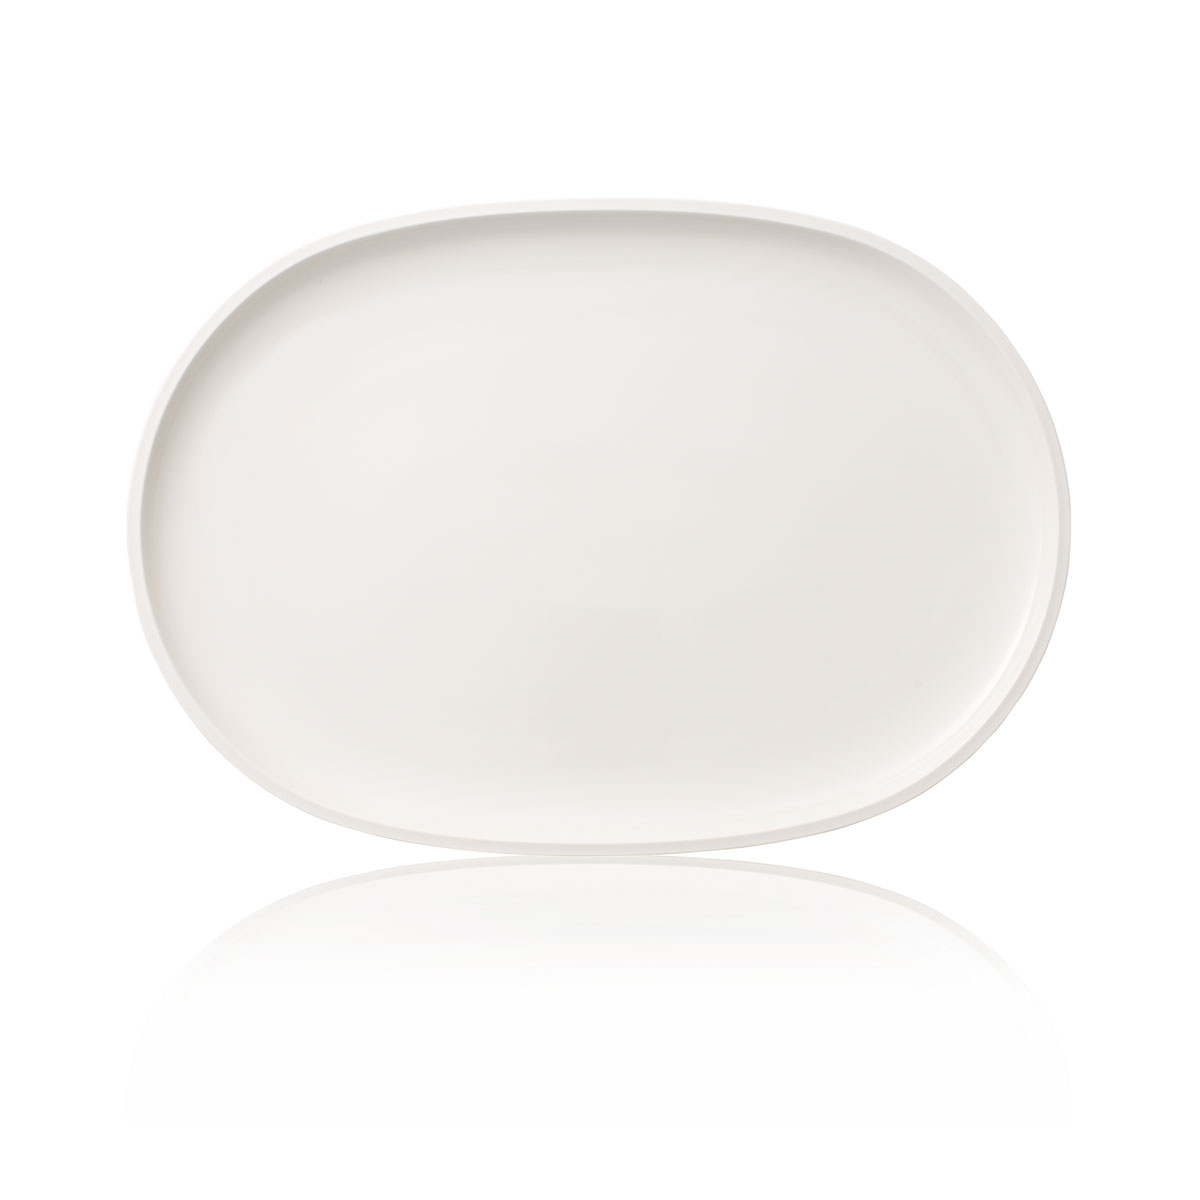 "Villeroy and Boch Artesano Original 17"" Oval Fish Plate"